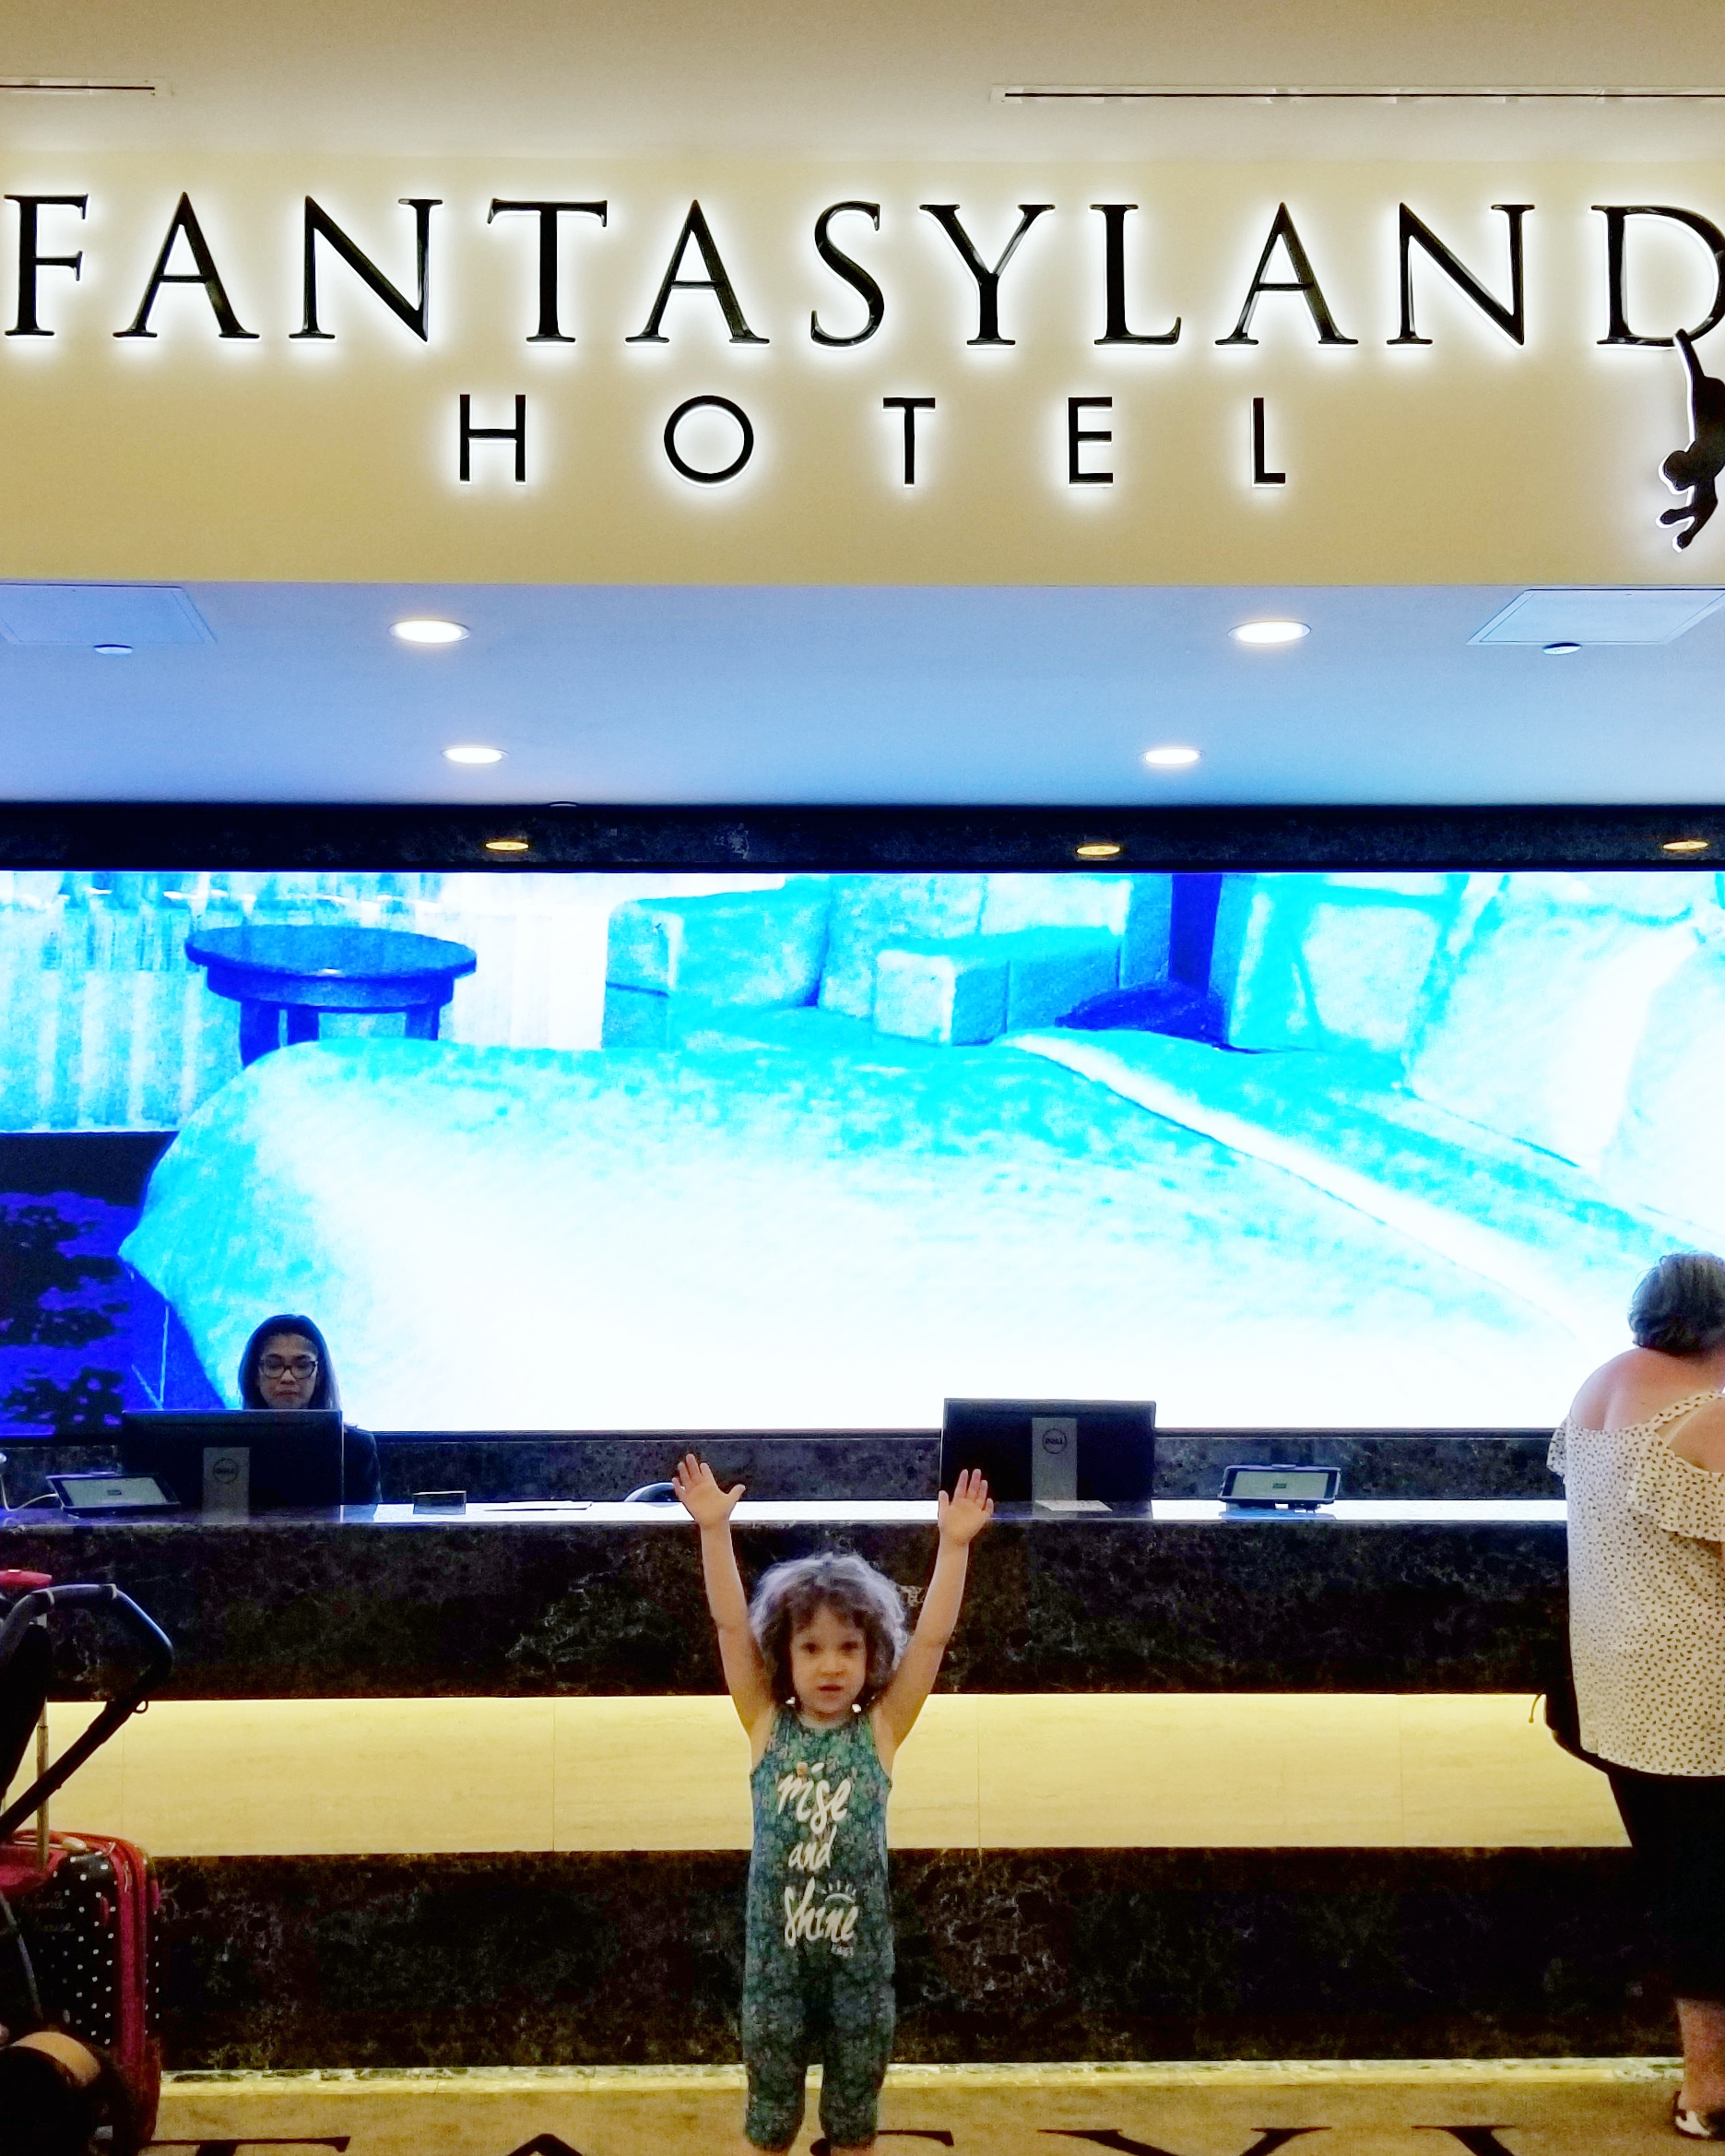 west edmonton mall fantasyland hotel.jpg